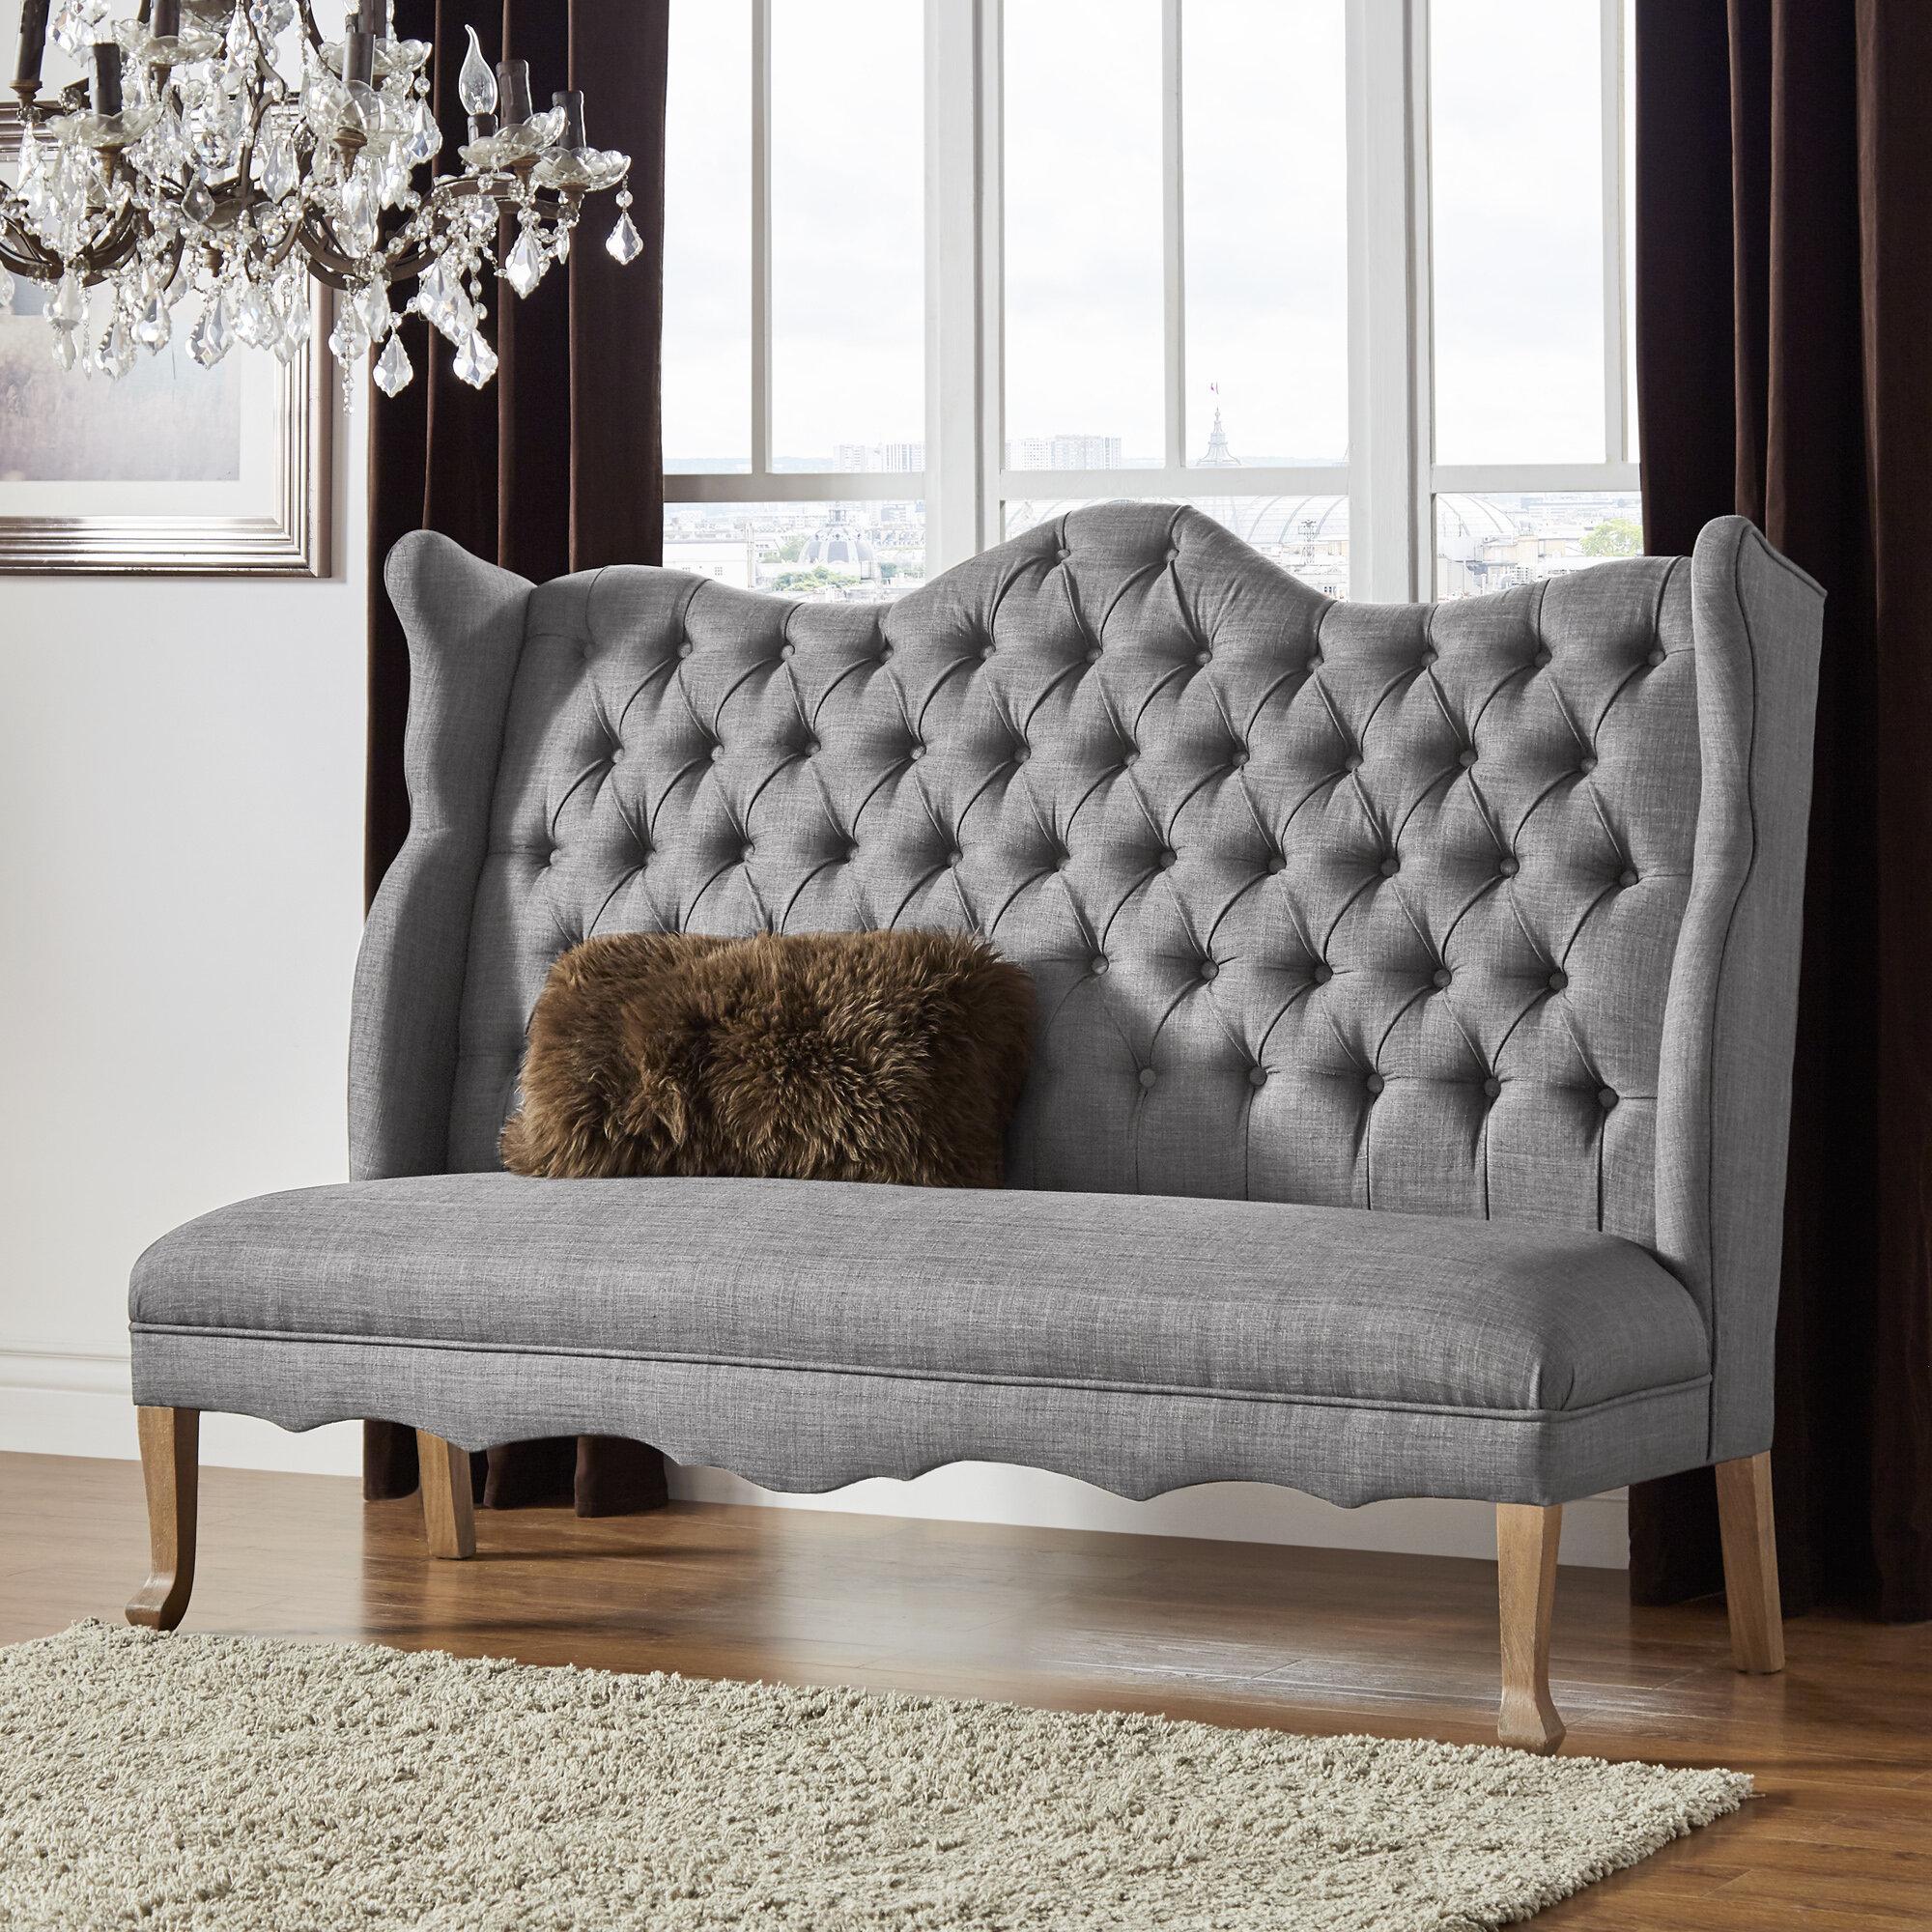 Janell Tufted Upholstered Bedroom Bench